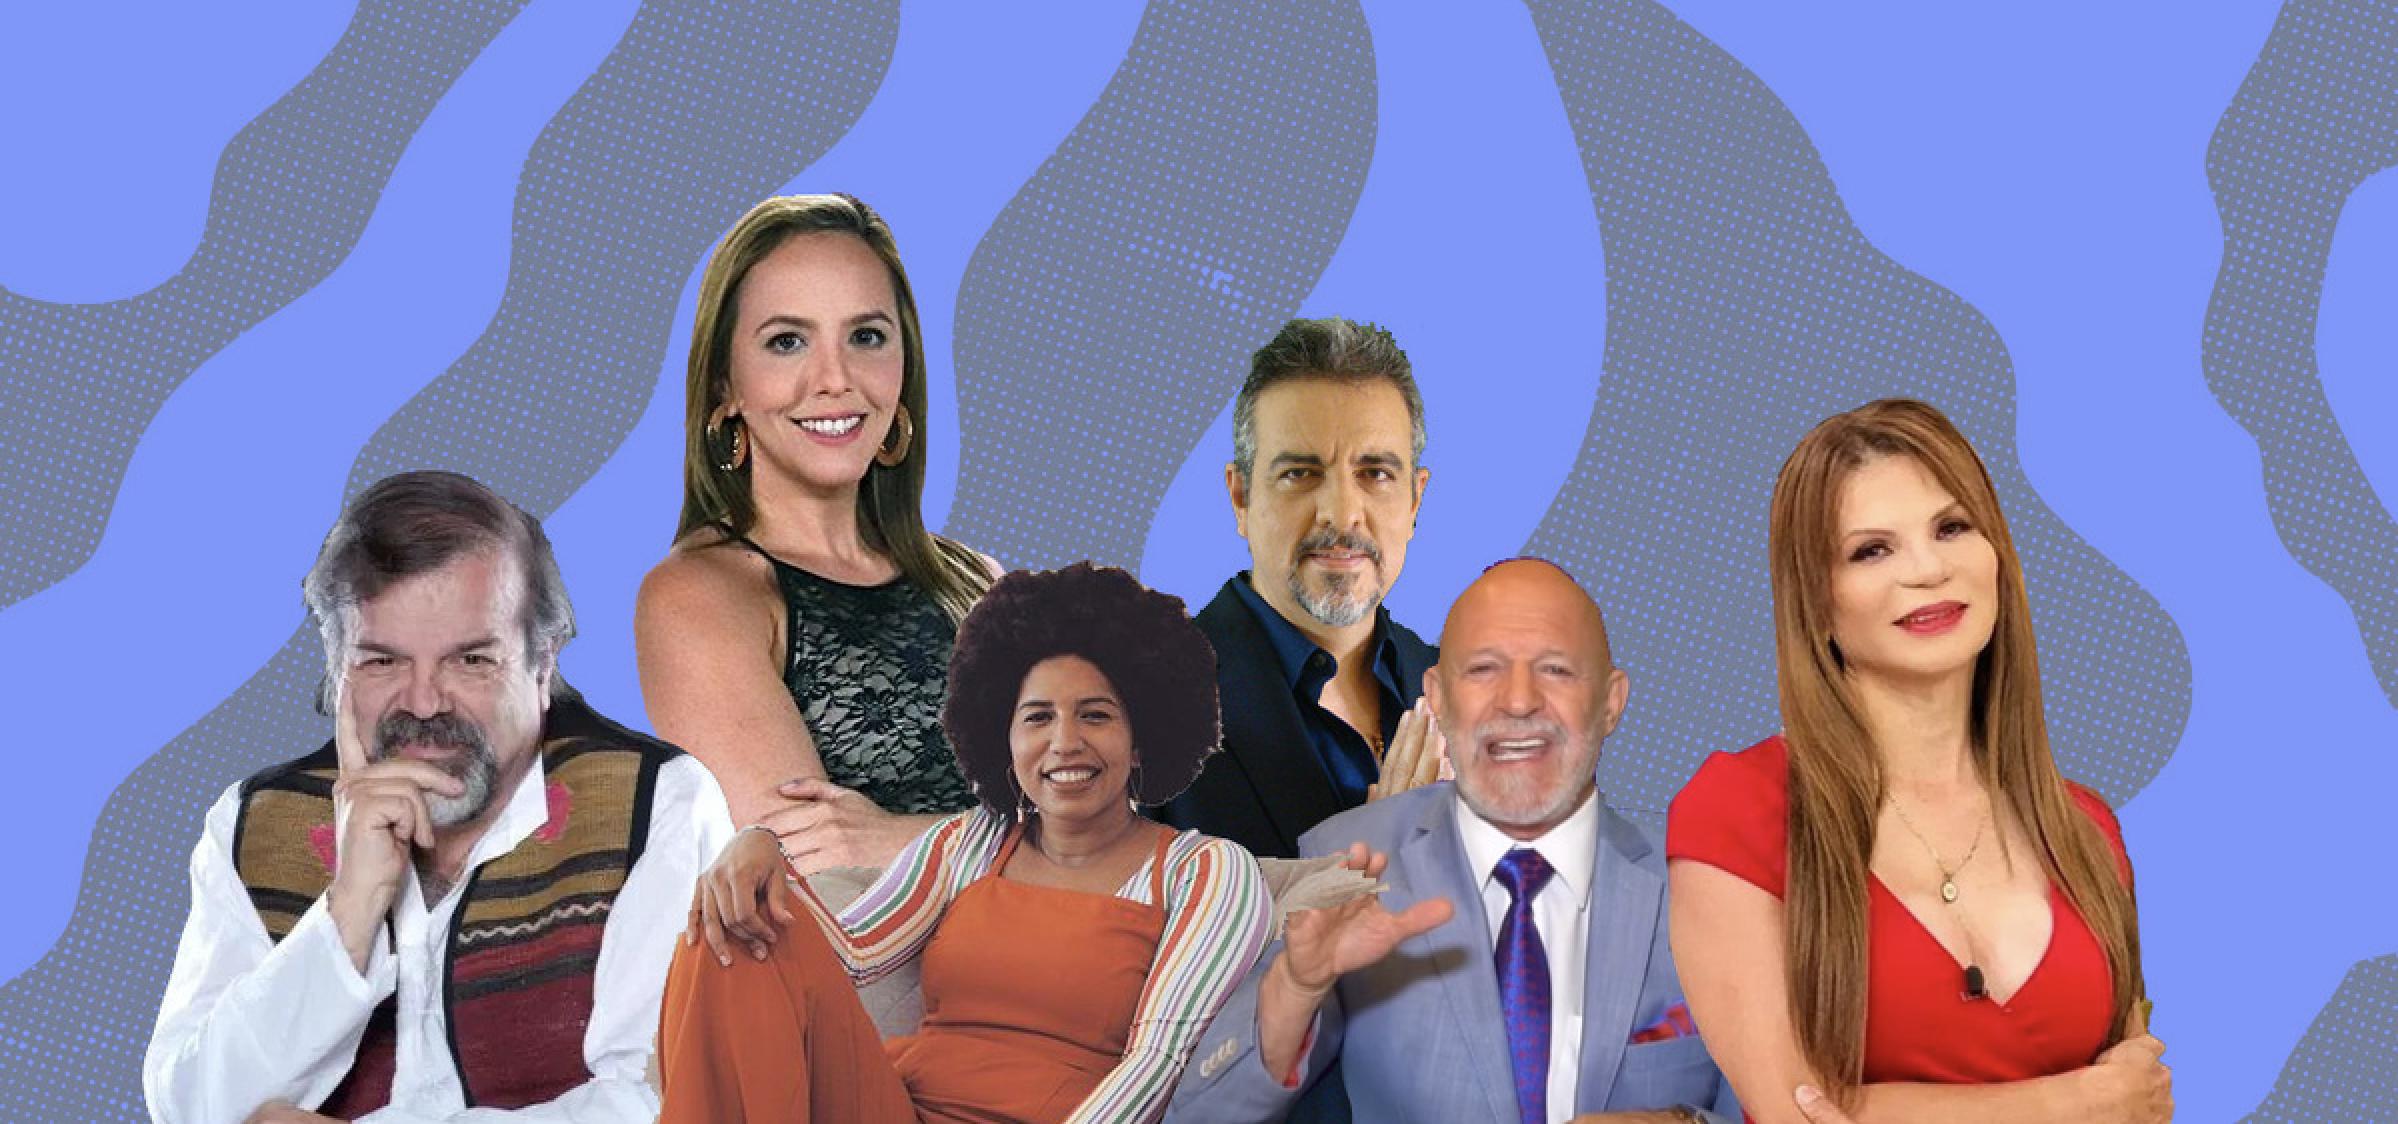 6 Latin American Astrologers Who Aren't Walter Mercado